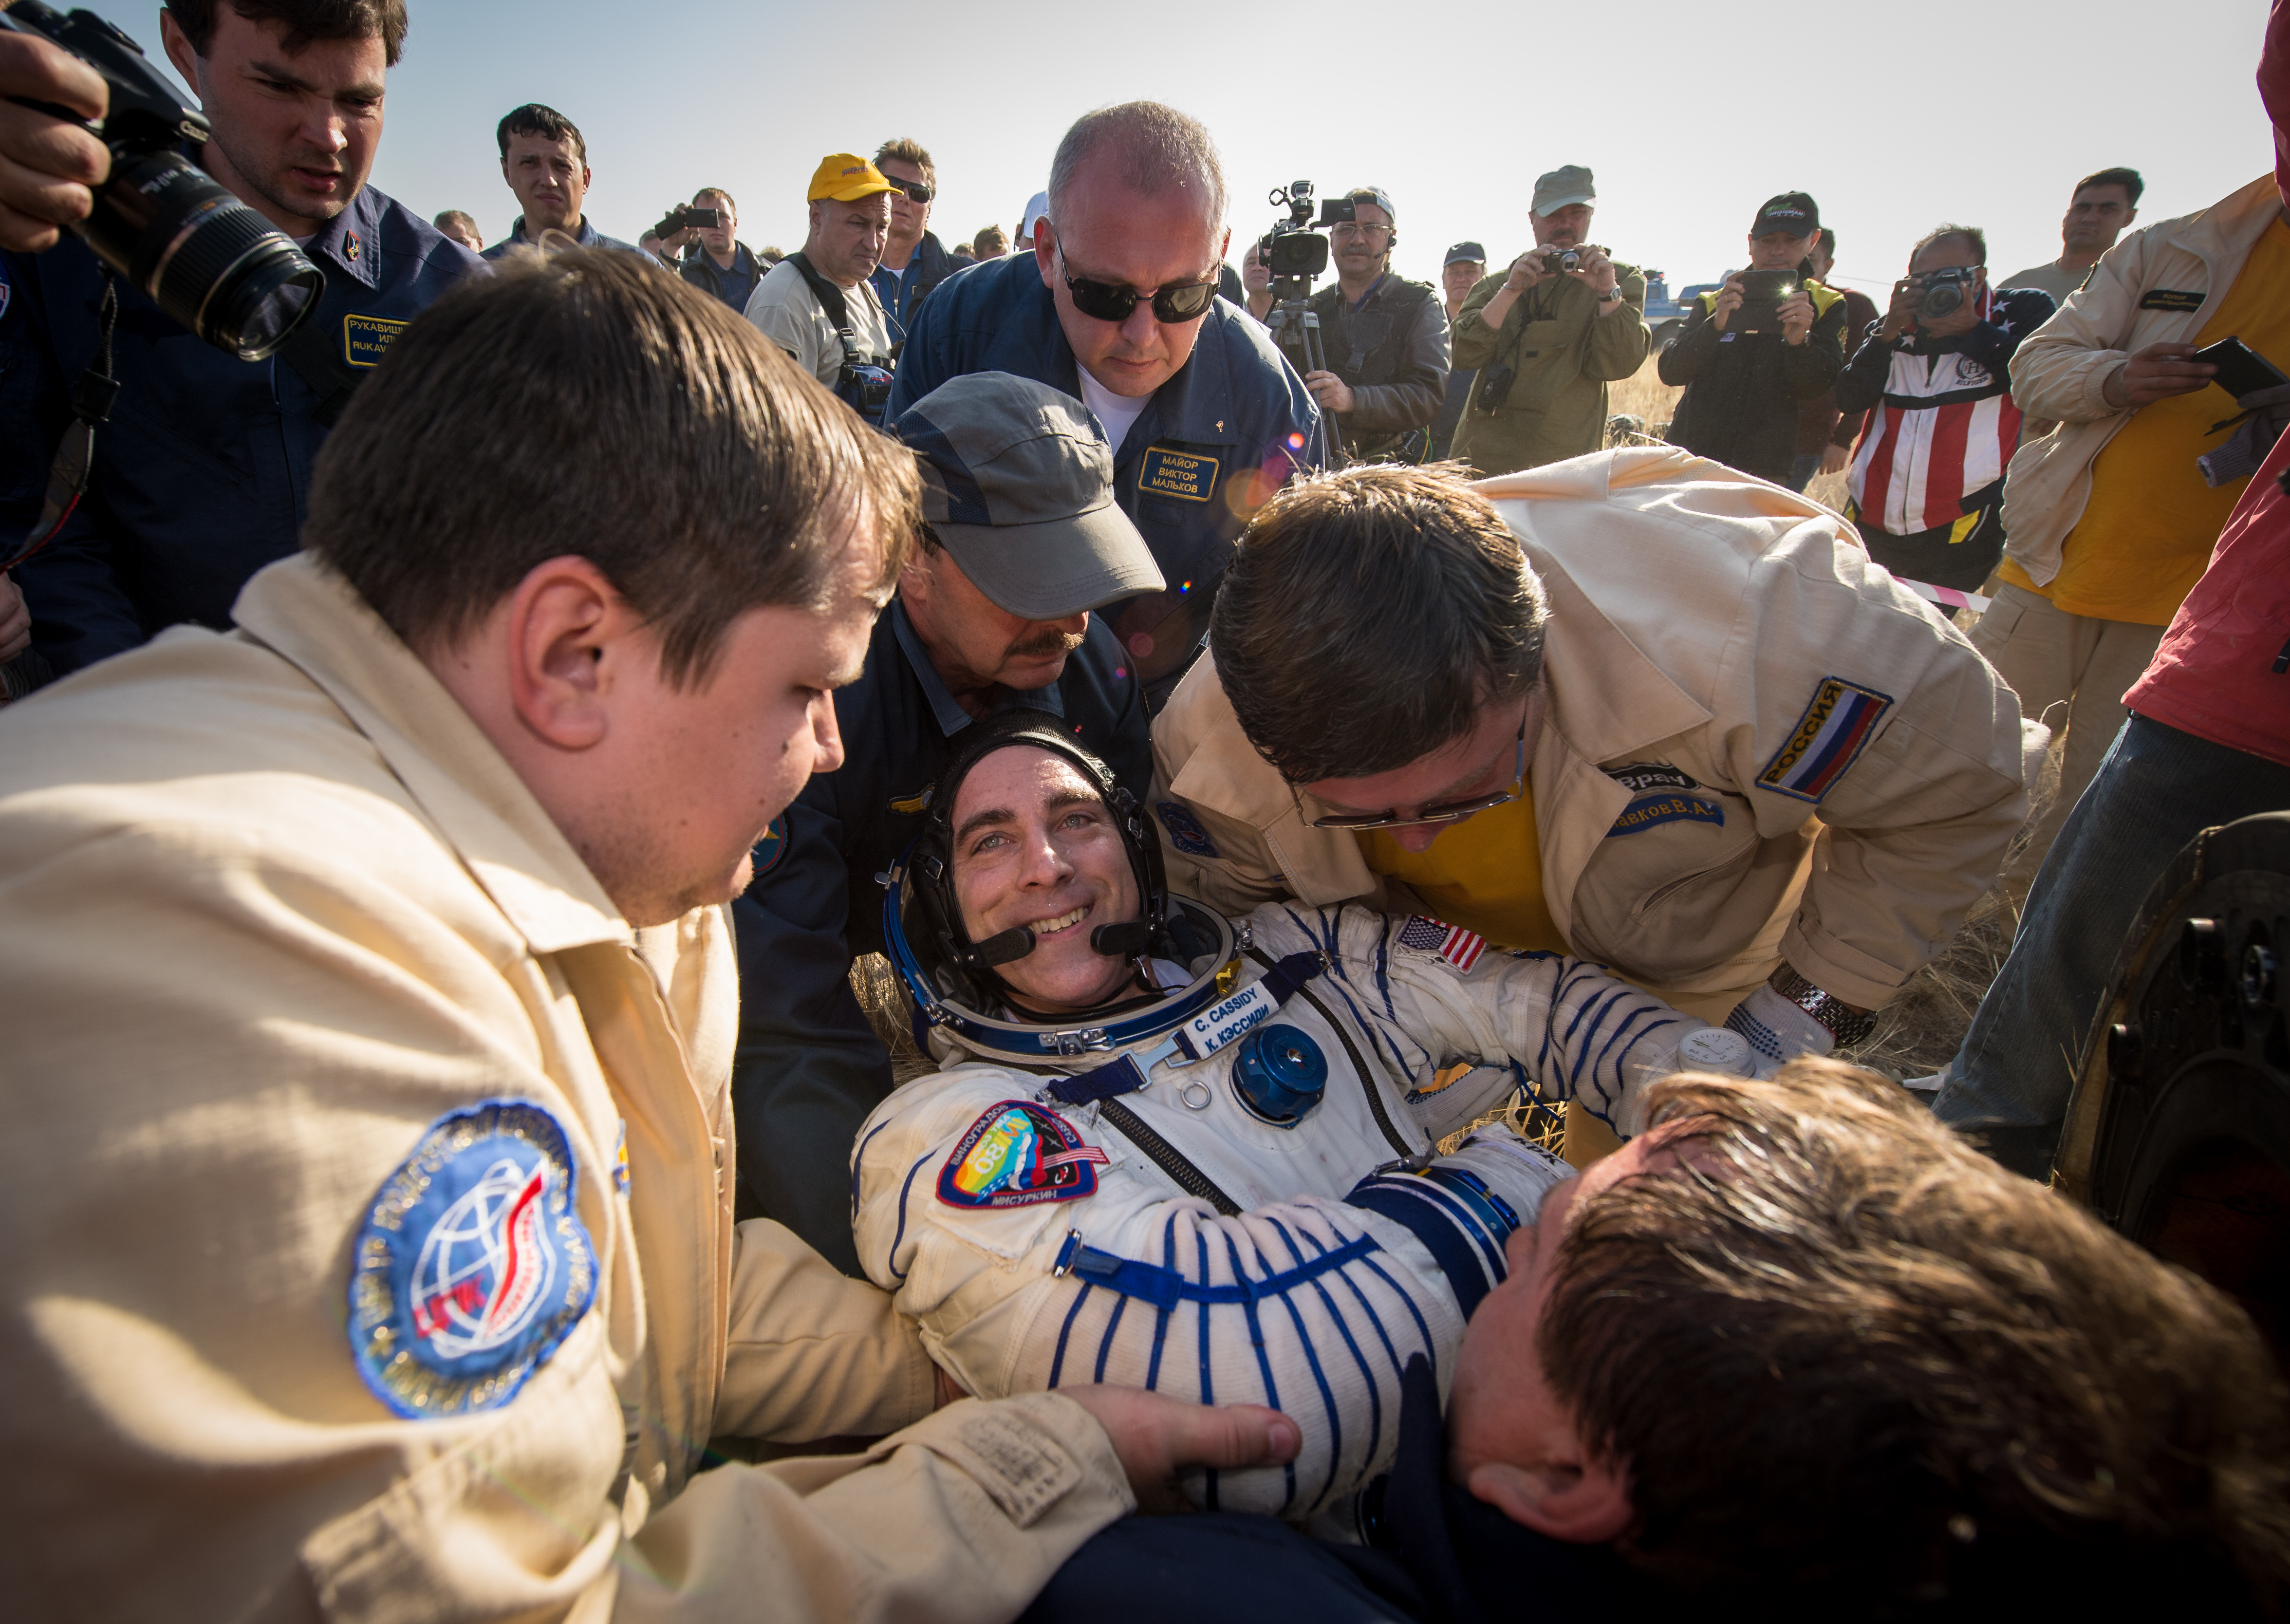 Chris Cassidy Exits Soyuz Capsule